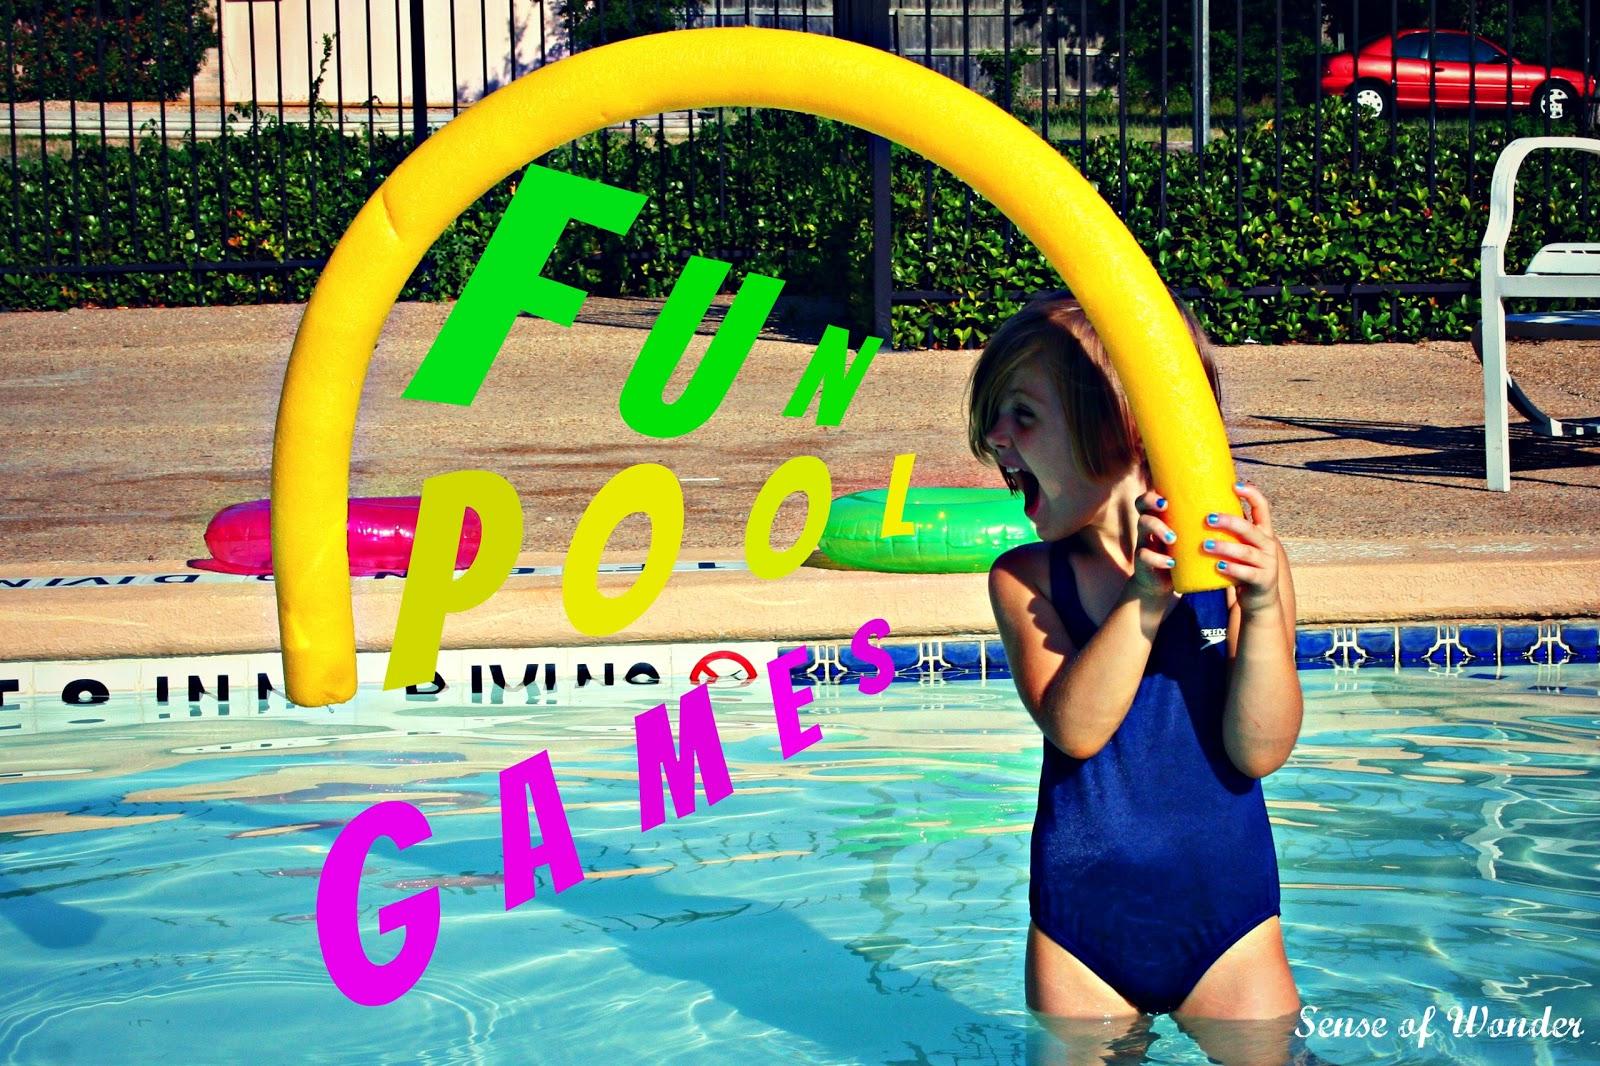 a pool game